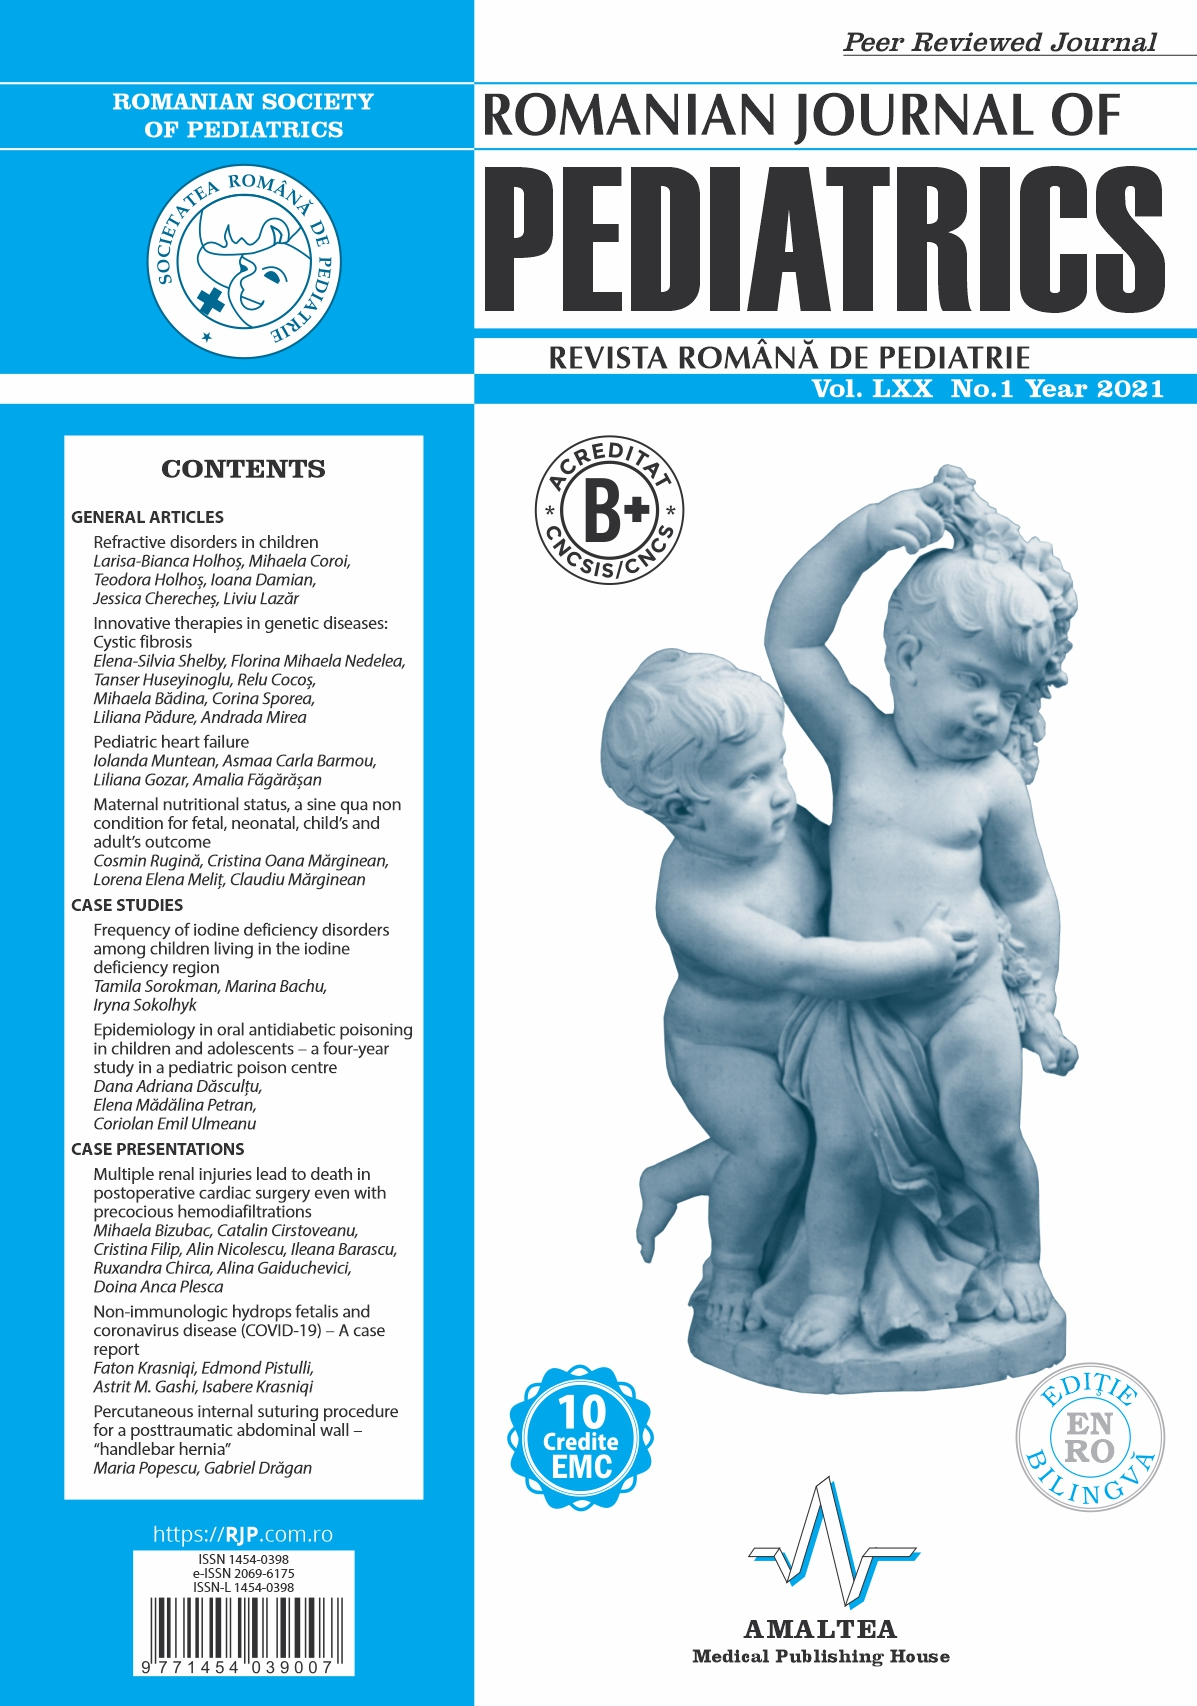 Romanian Journal of Pediatrics | Volume LXX, No. 1, Year 2021